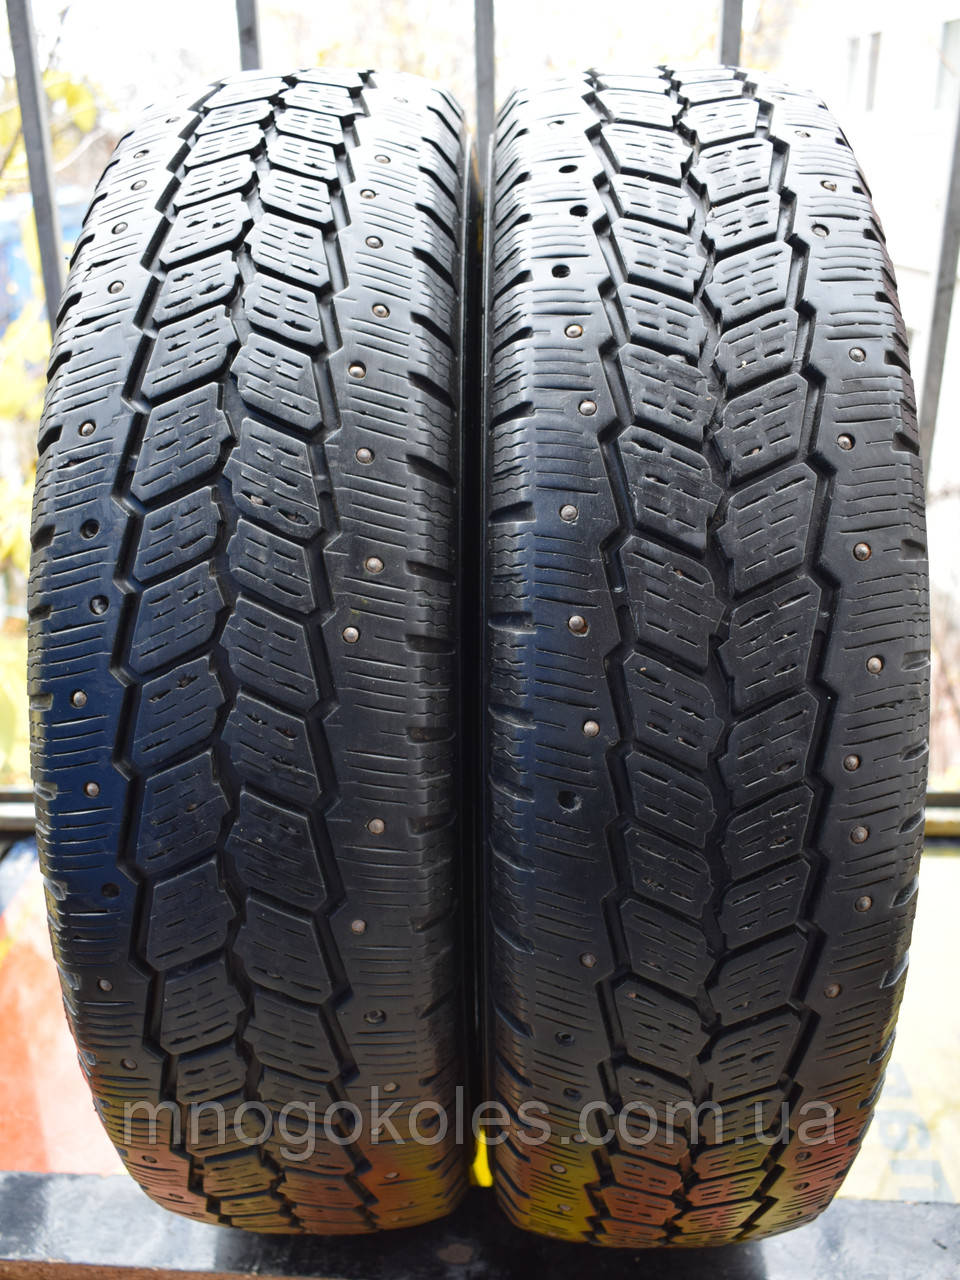 Шины б/у 185 R14С Michelin Agilis 81 Snow-Ice, шип-ЗИМА, 6 мм, пара